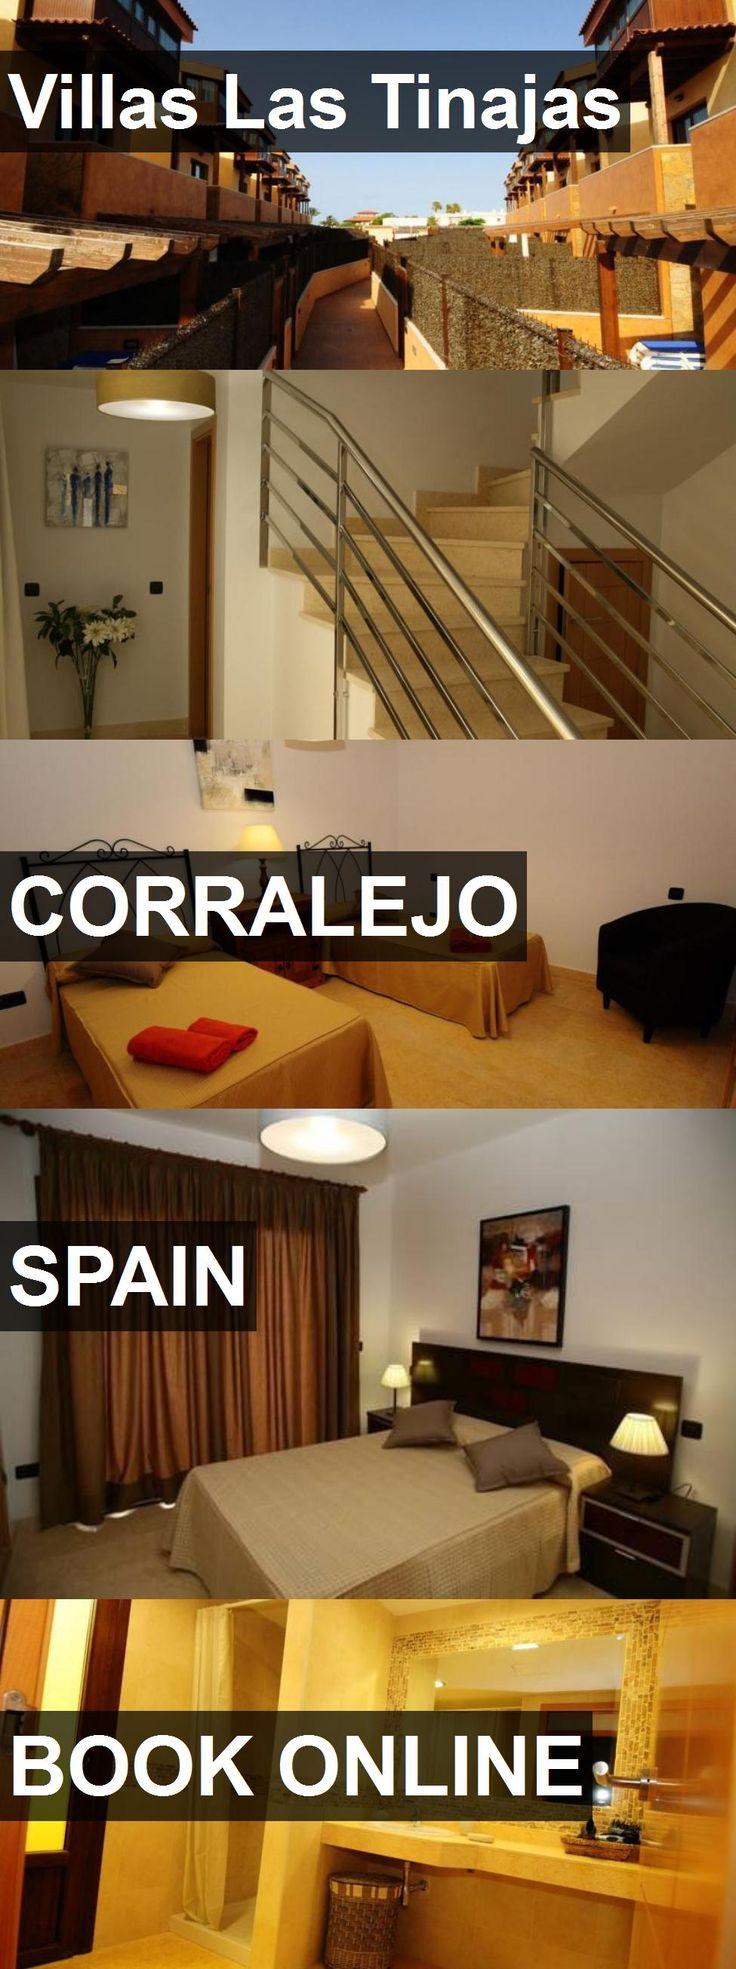 Hotel Villas Las Tinajas in Corralejo, Spain. For more information, photos, reviews and best prices please follow the link. #Spain #Corralejo #VillasLasTinajas #hotel #travel #vacation